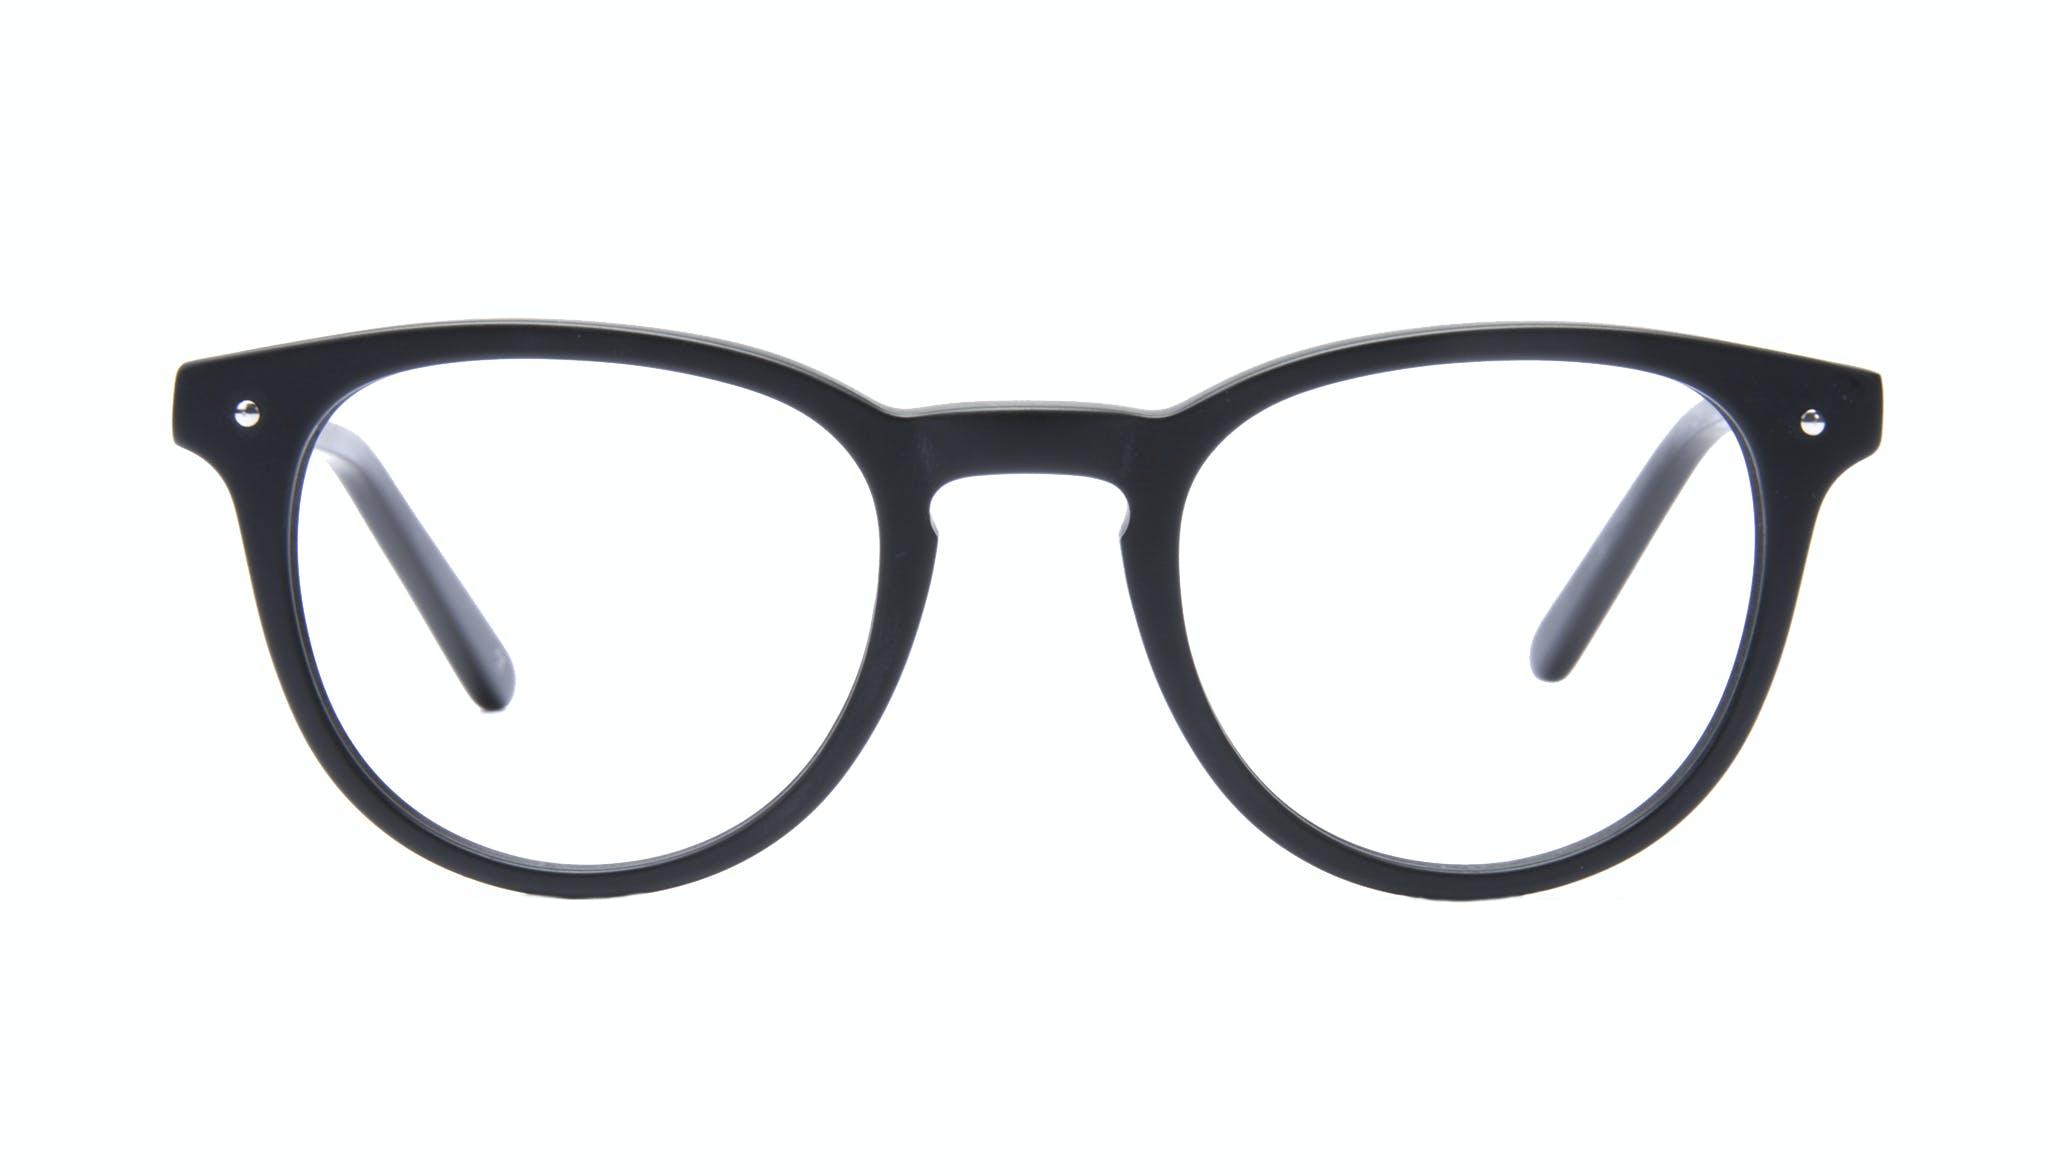 Affordable Fashion Glasses Round Eyeglasses Men Cult Matt Black Front